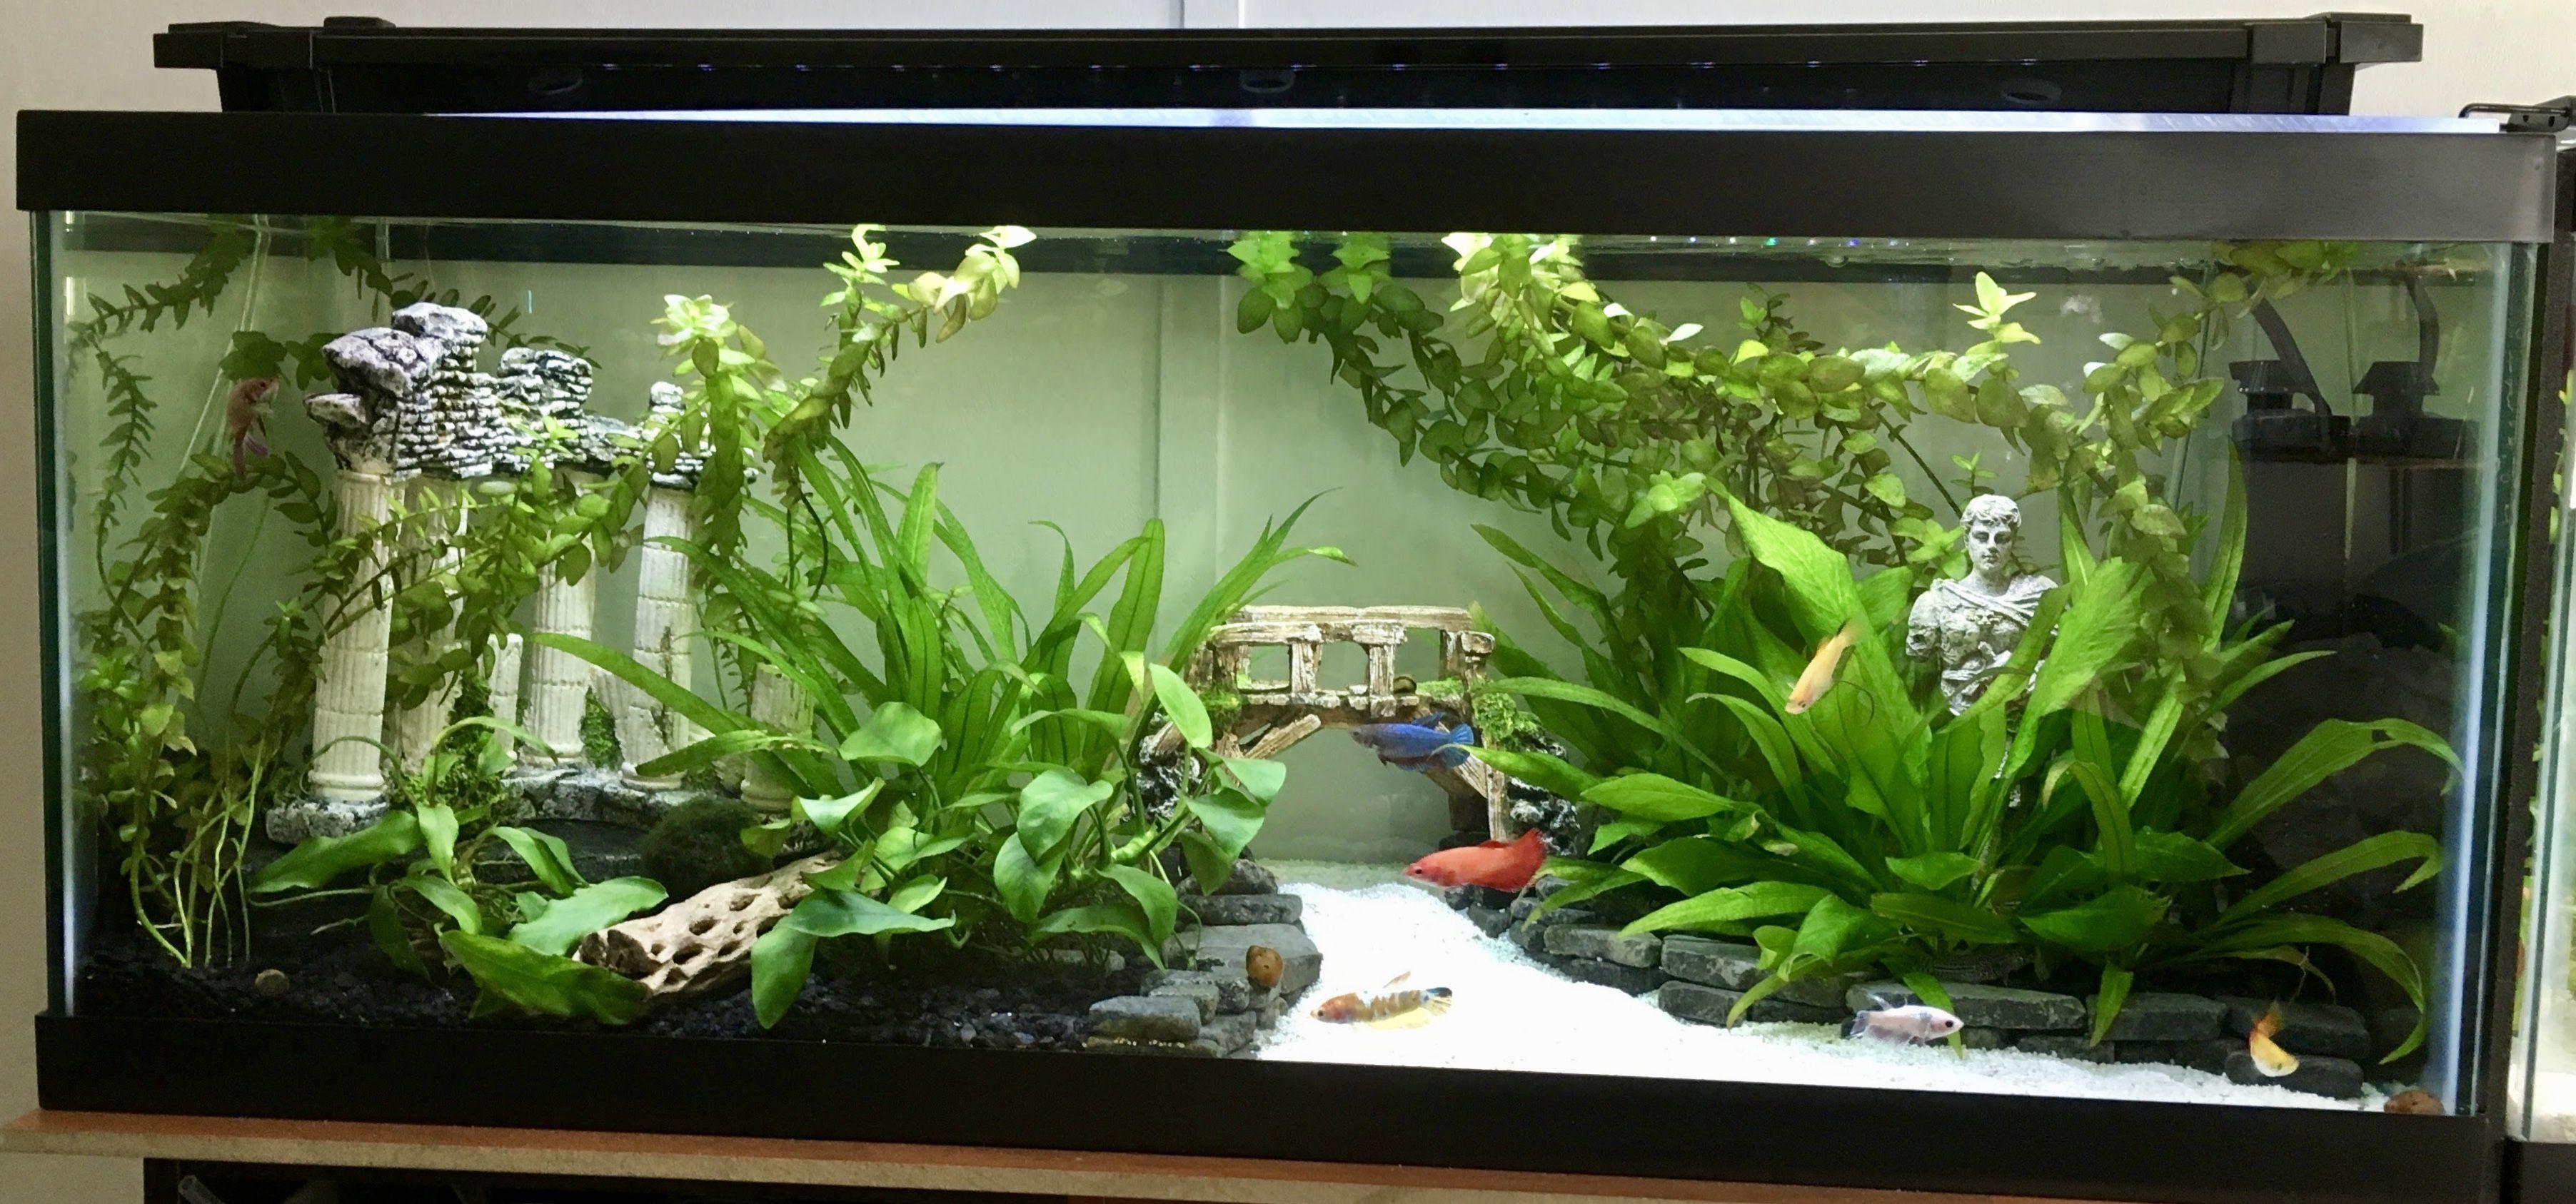 57fdc740278ede2c437b3b8c0319d6cd Jpg Community Fish Tank Betta Fish Fish Tank Themes